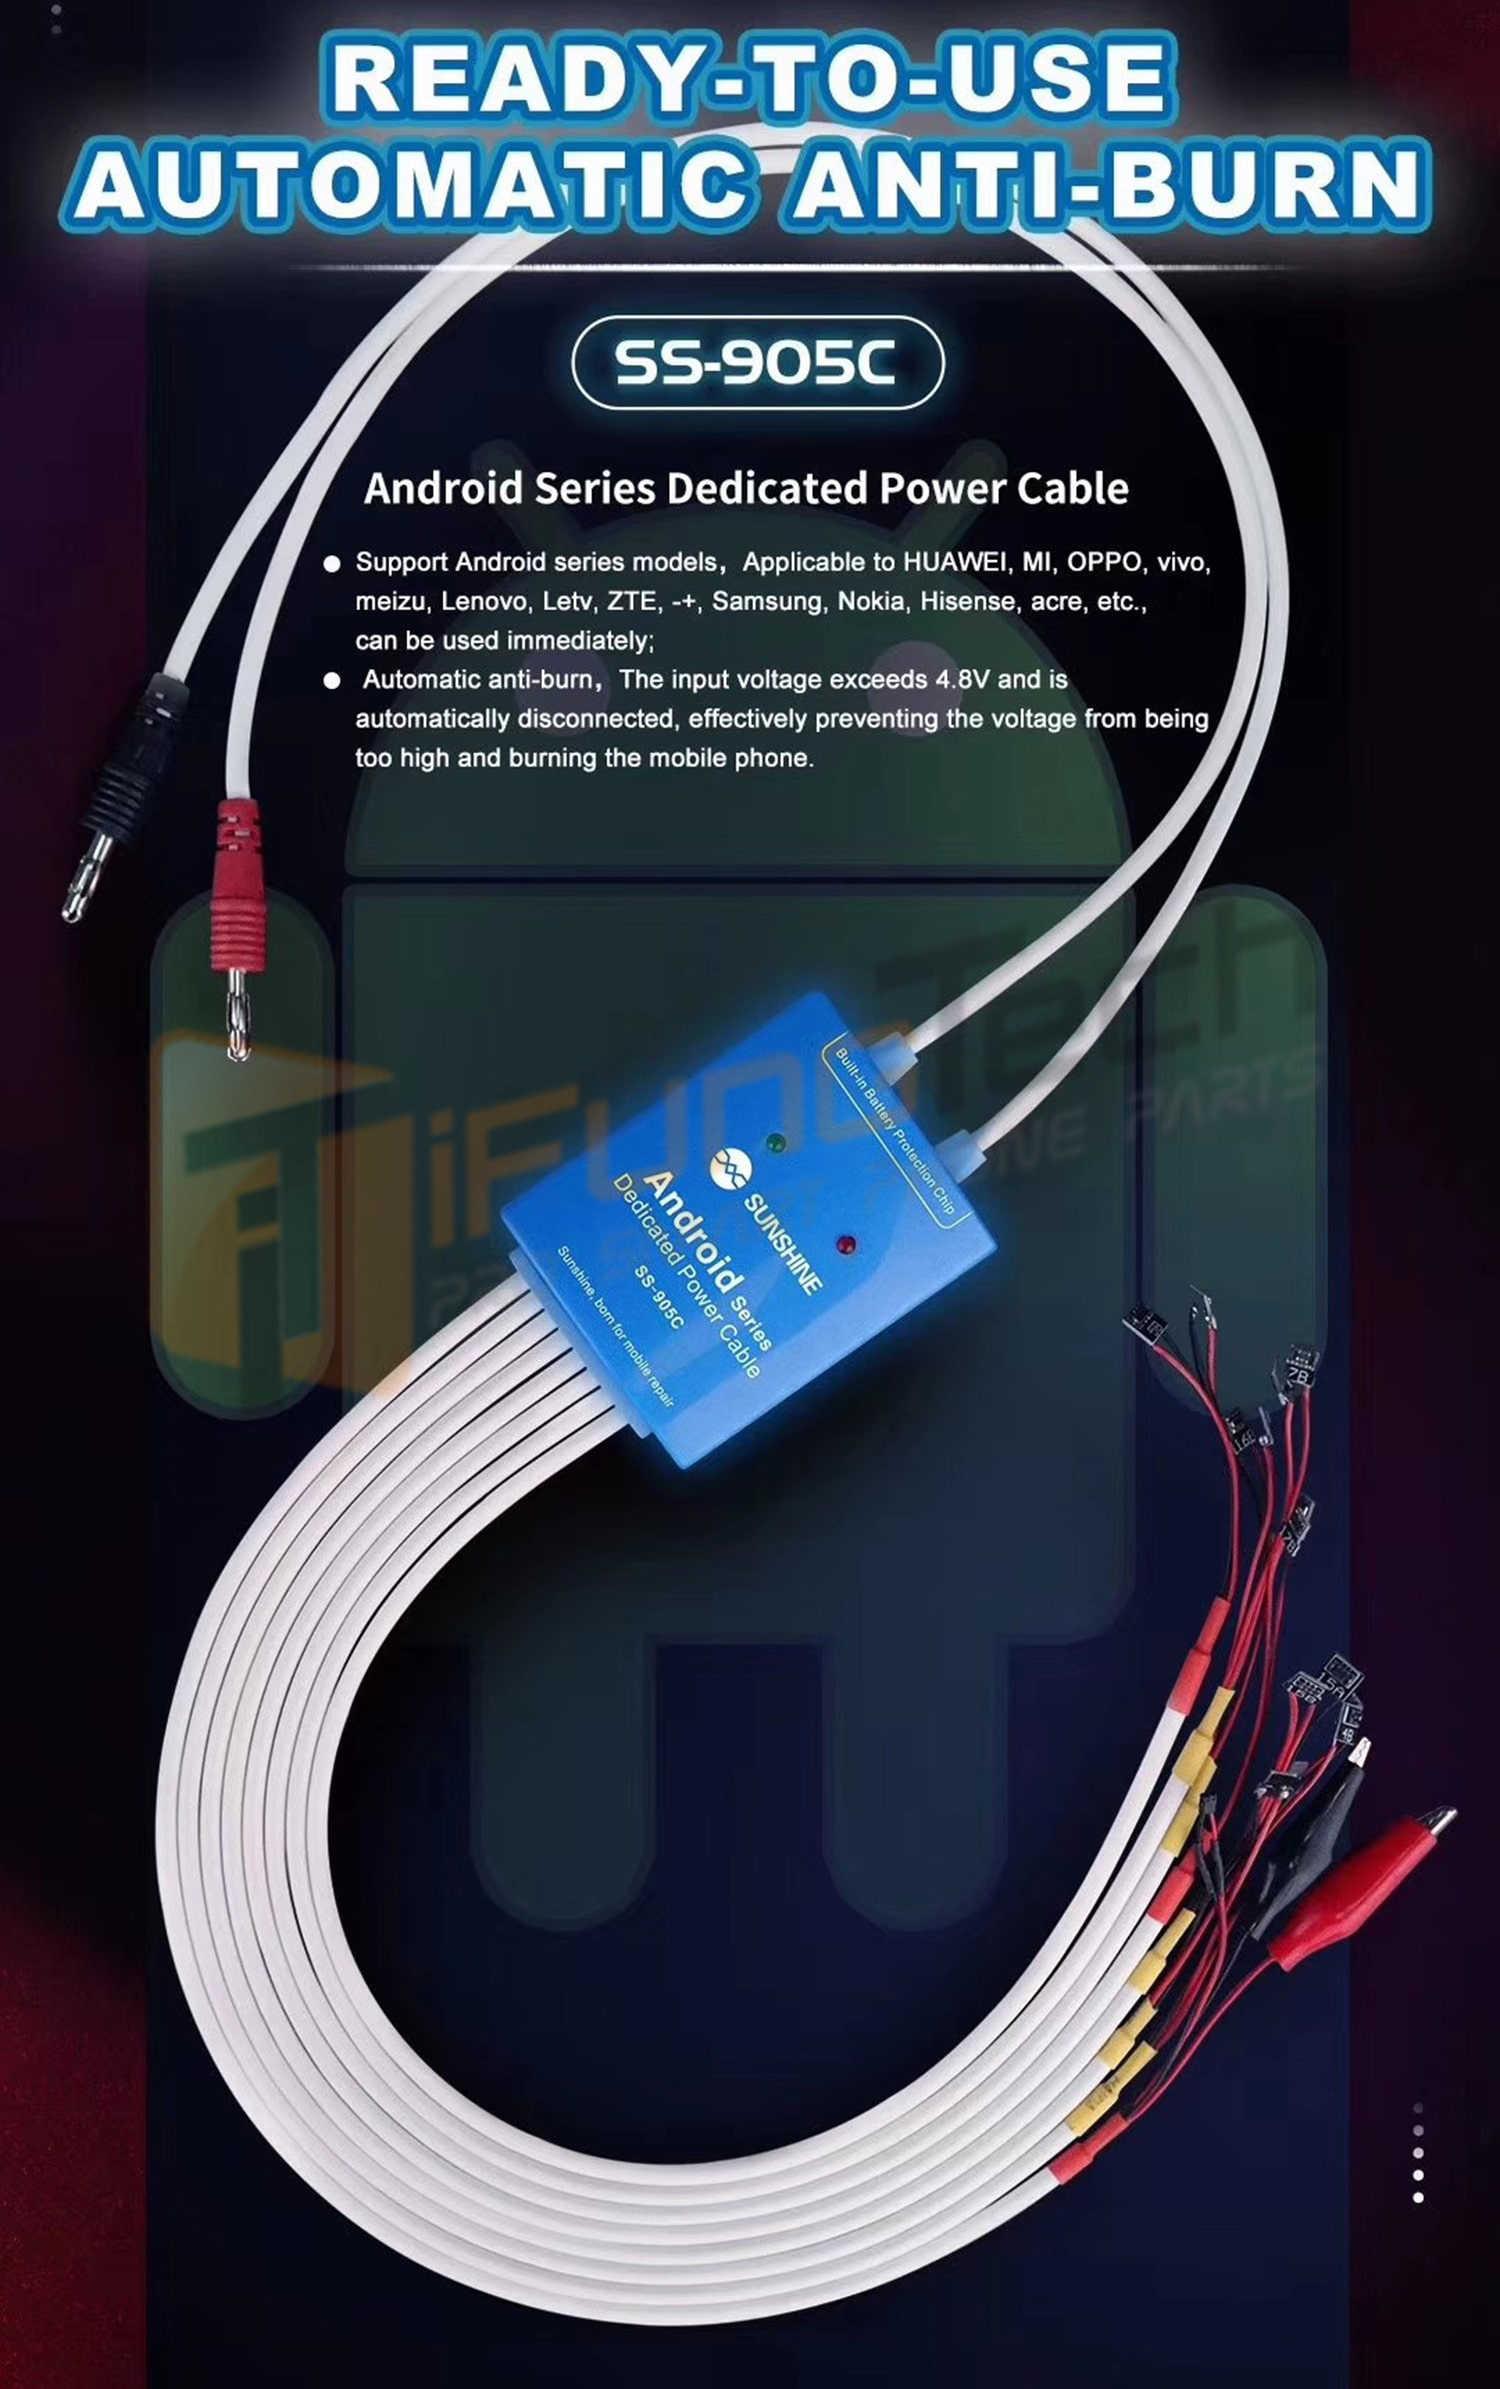 USB Printer Scanner Cable Cord Lead For HP Deskjet 990cse 990cxi 995c 1220c-ps